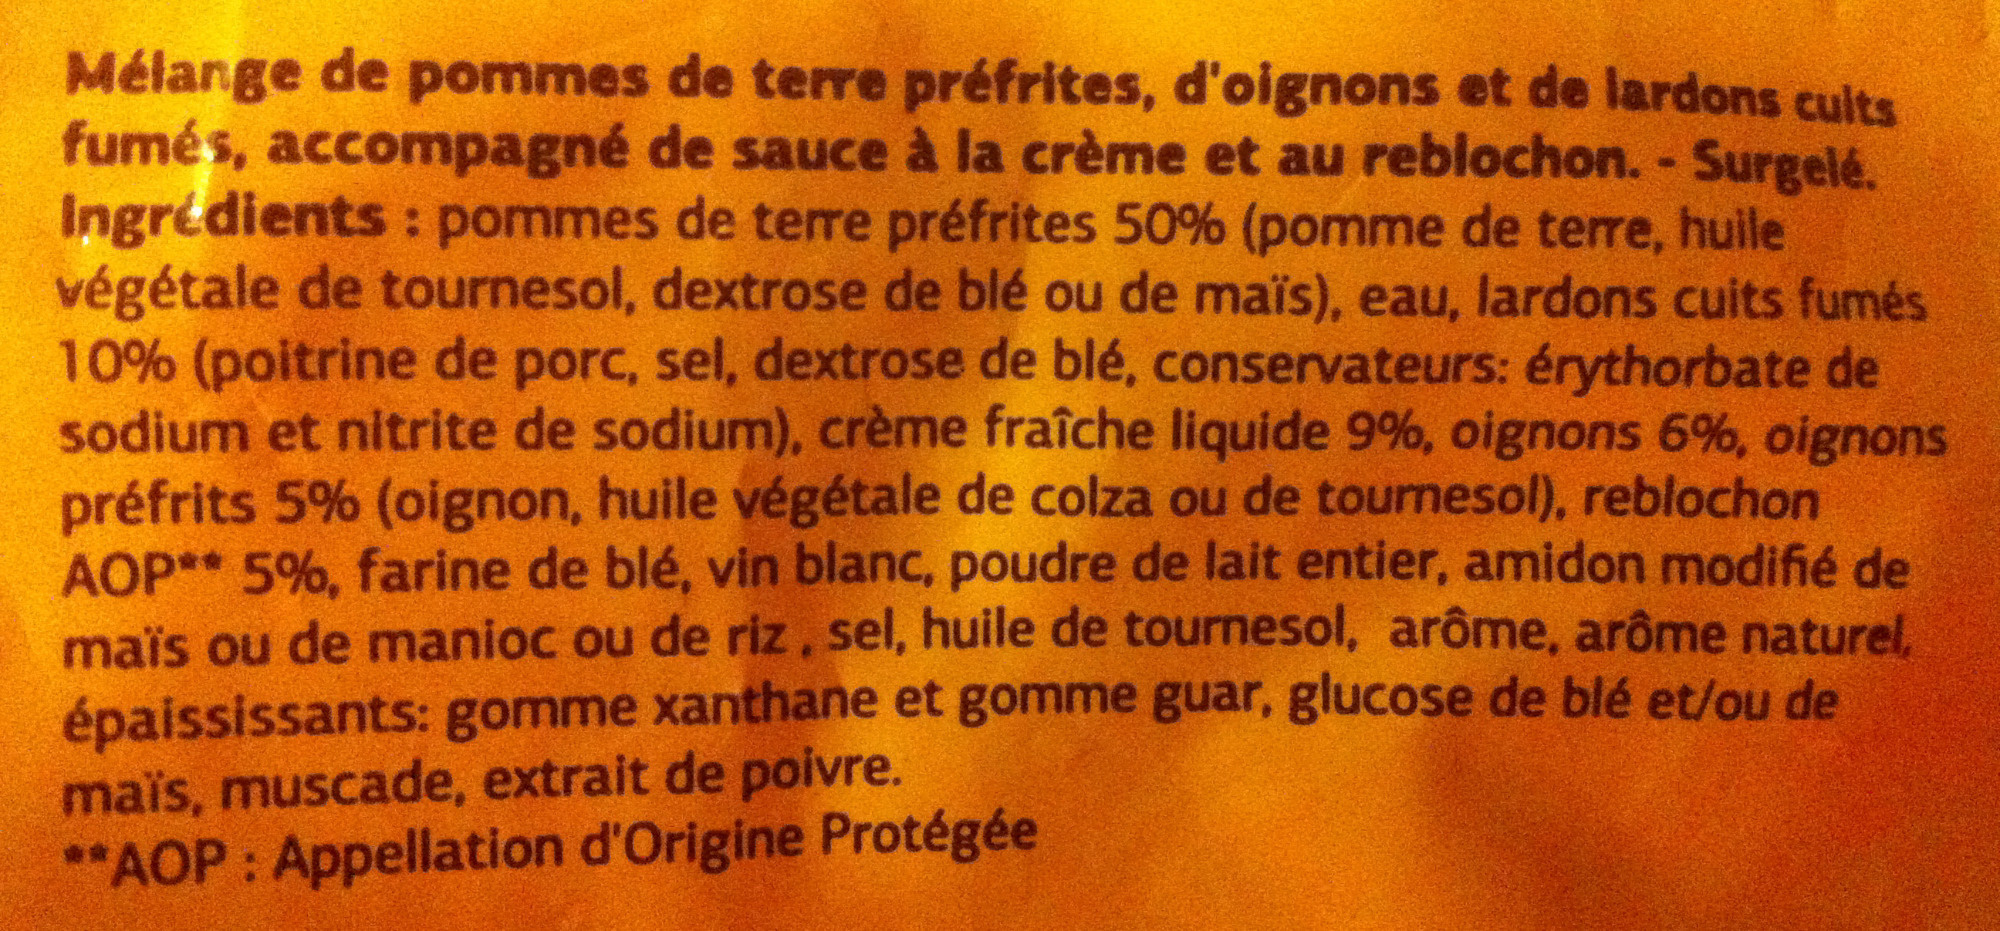 Tartiflette Surgelée - Ingrédients - fr